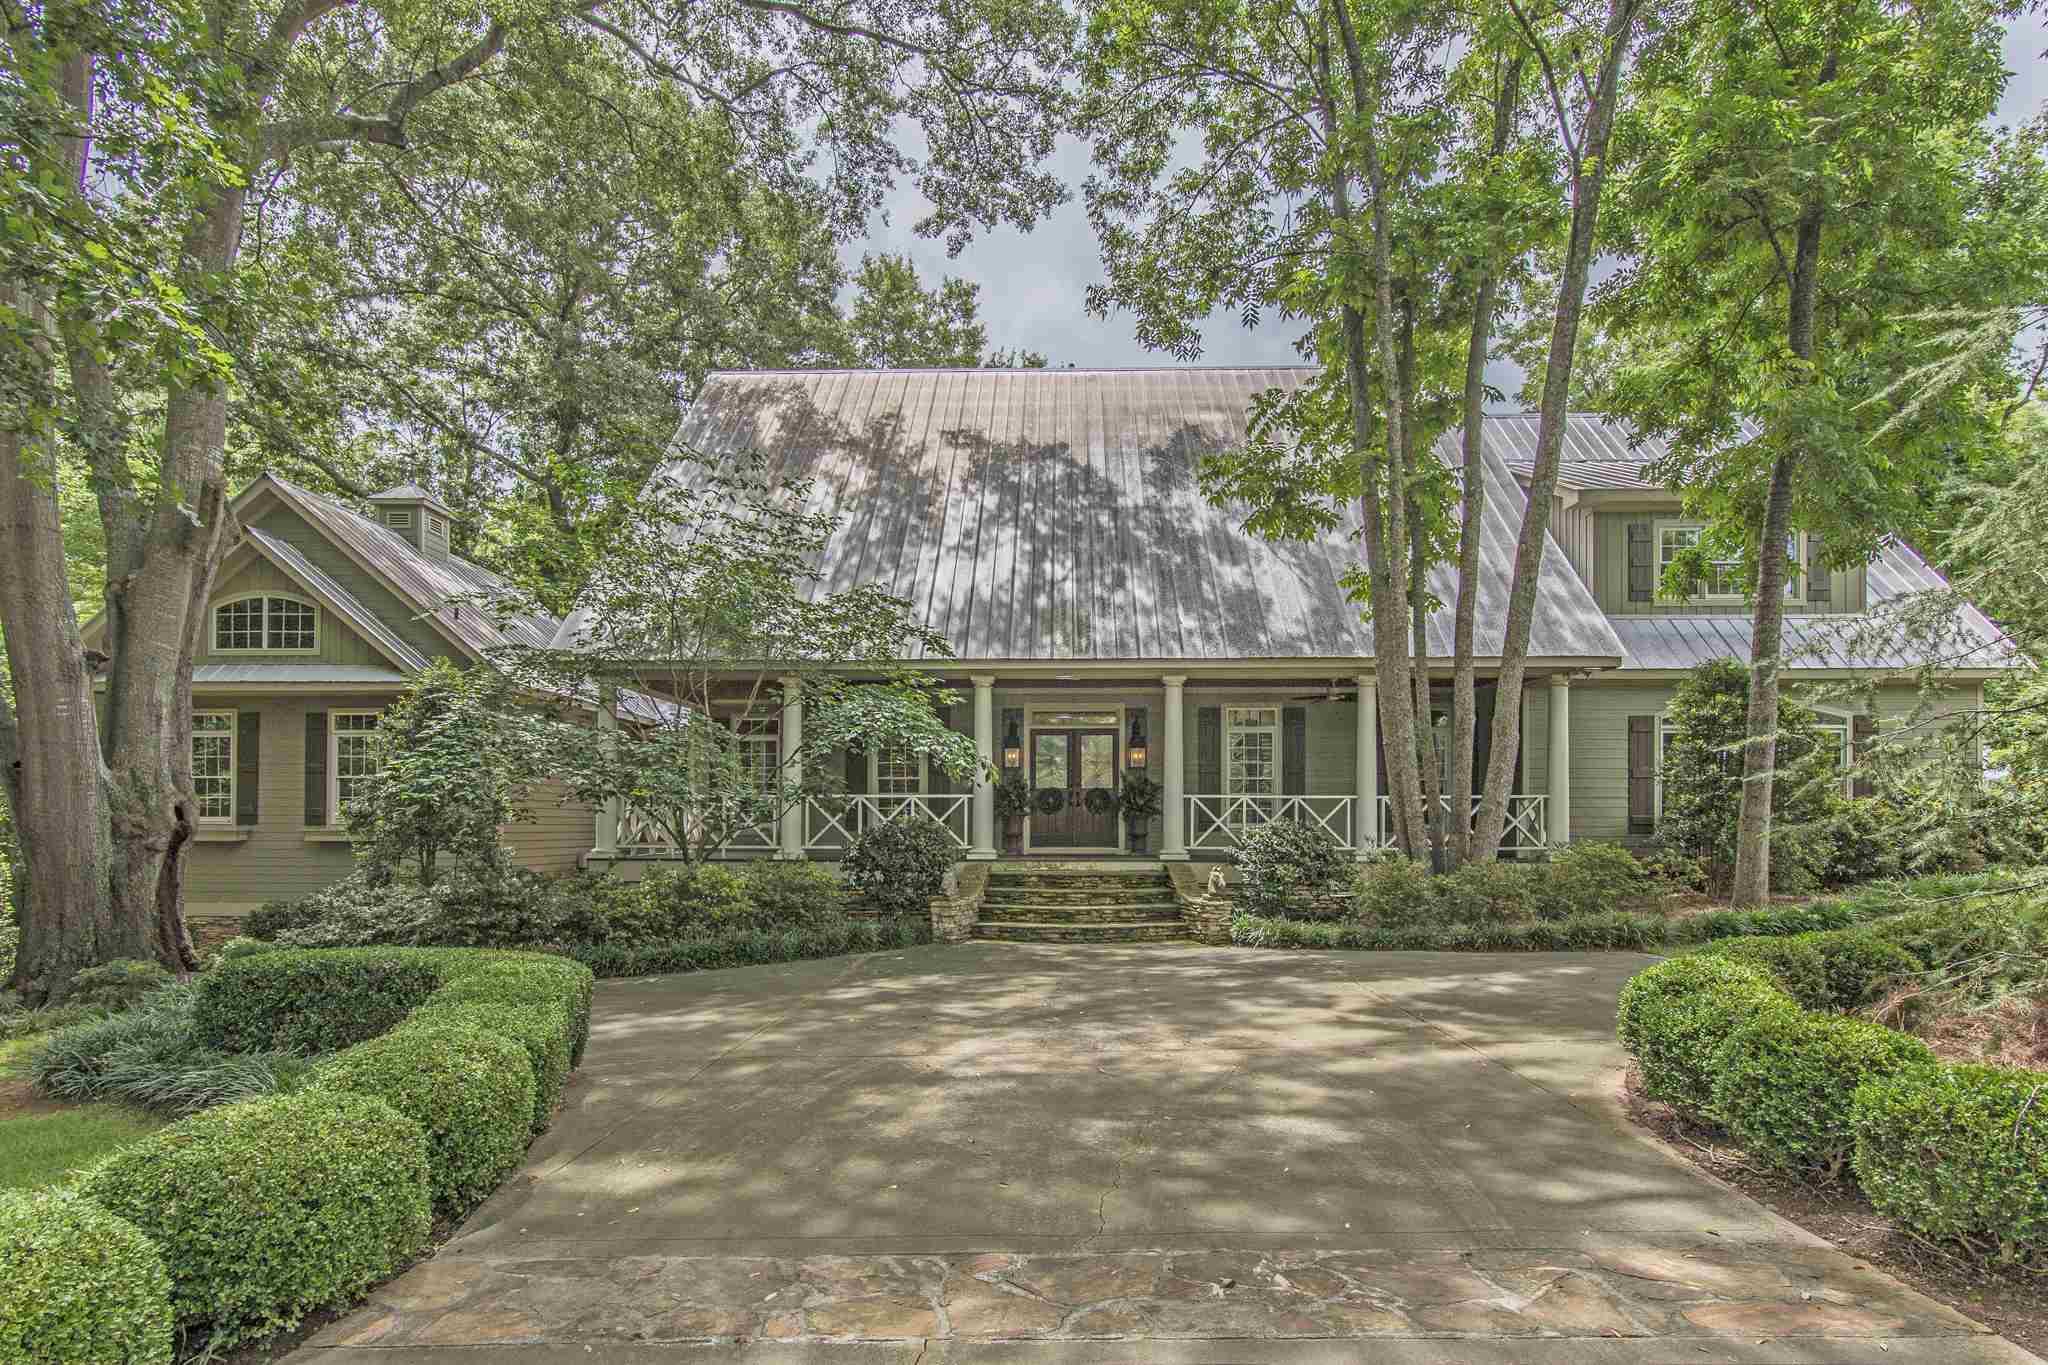 174 Copelan Farm Road, Eatonton, GA  31024 For Sale by Real Estate Lake Oconee